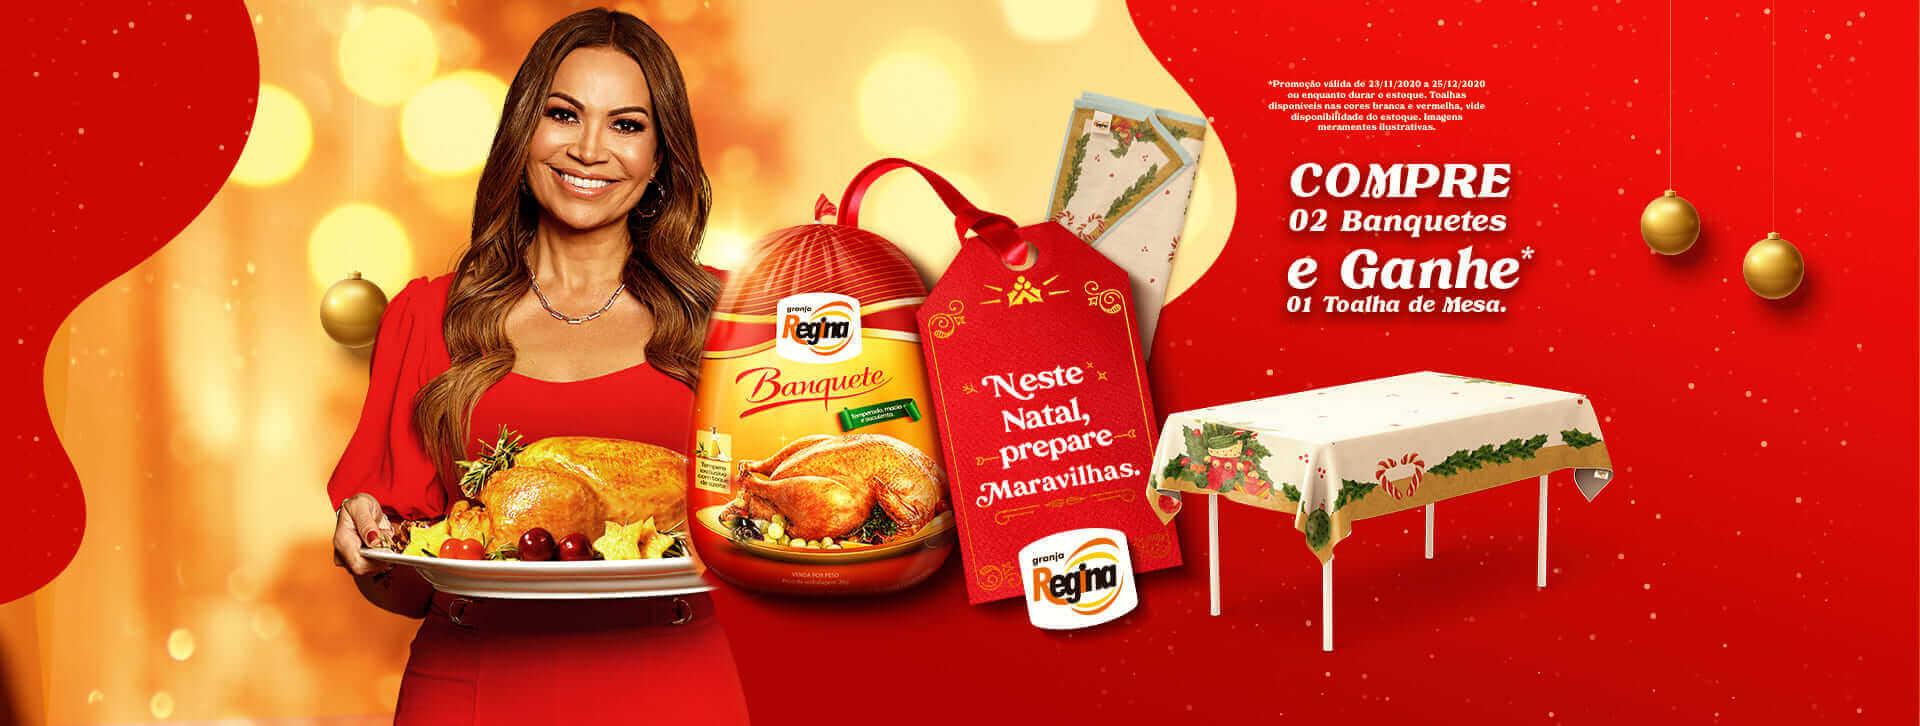 Banquete Granja Regina :